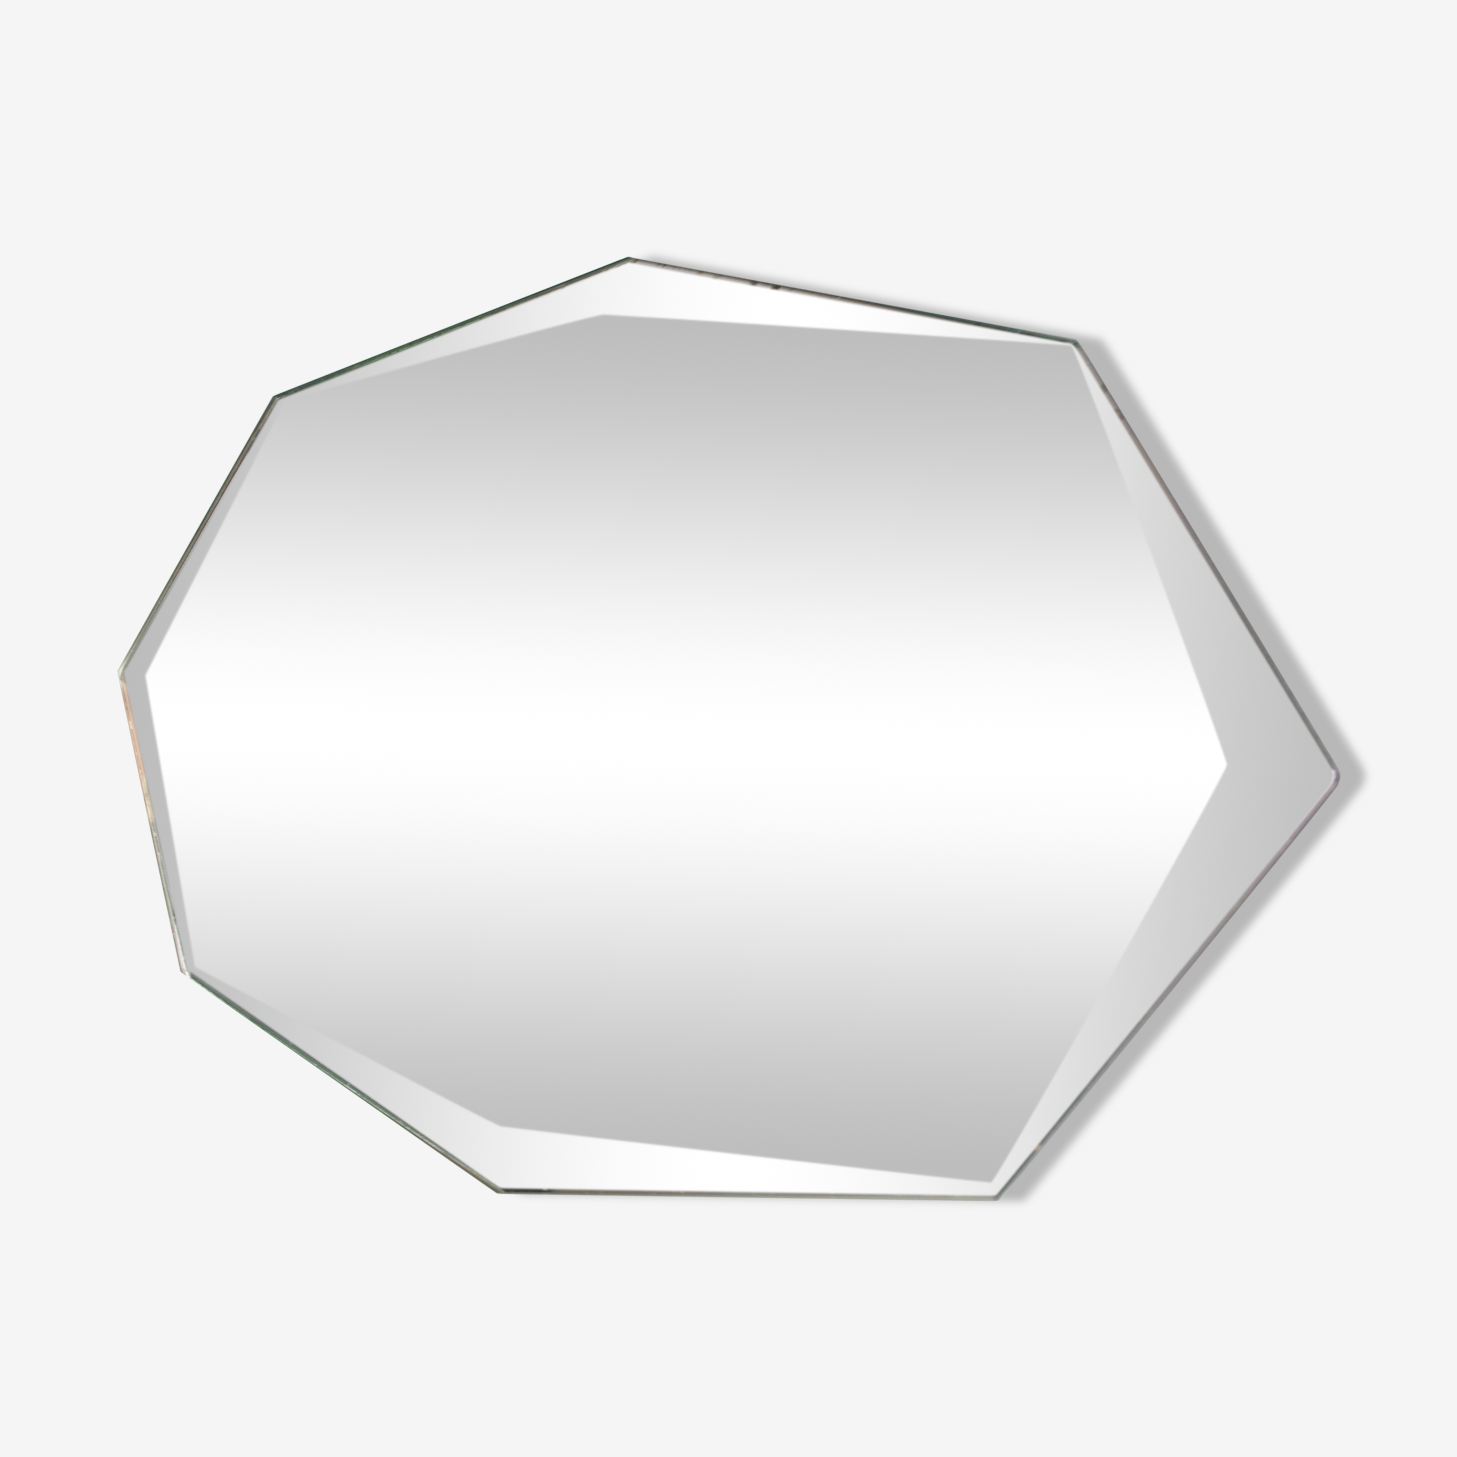 Miroir octogonal biseauté 23 x 44 cm